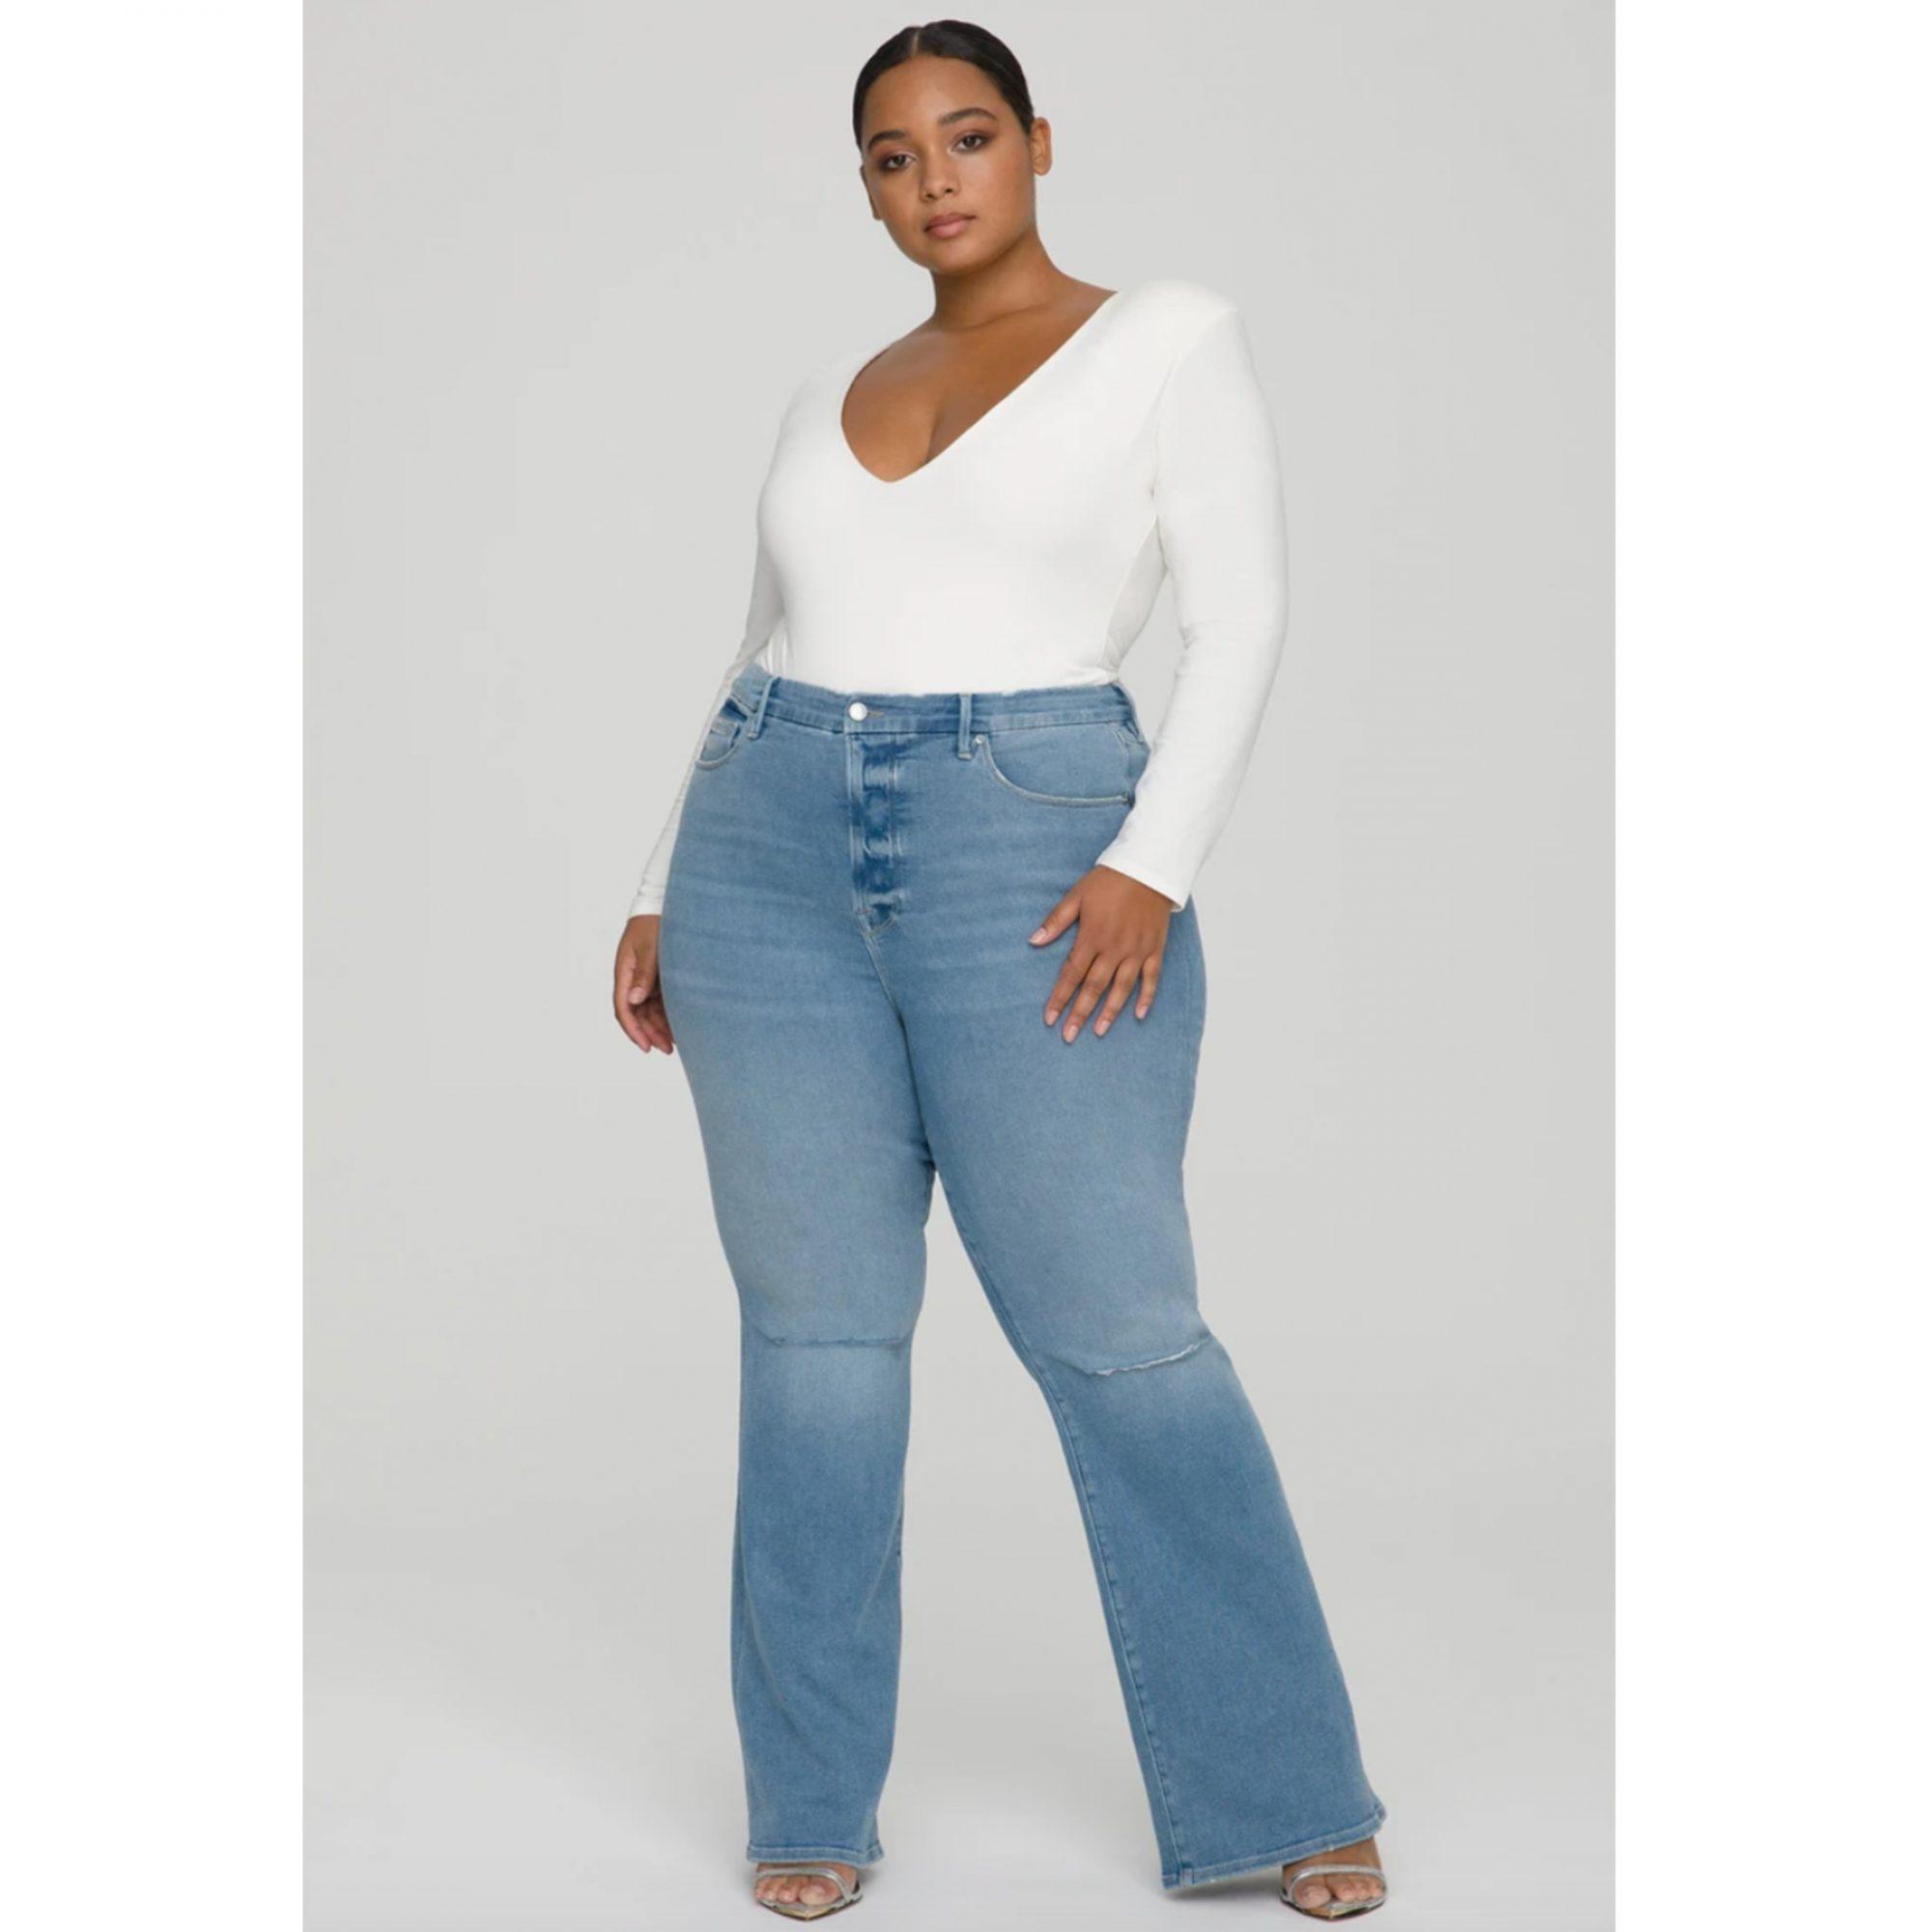 good-american-good-flare-deep-v-jeans, best-jeans-for-women